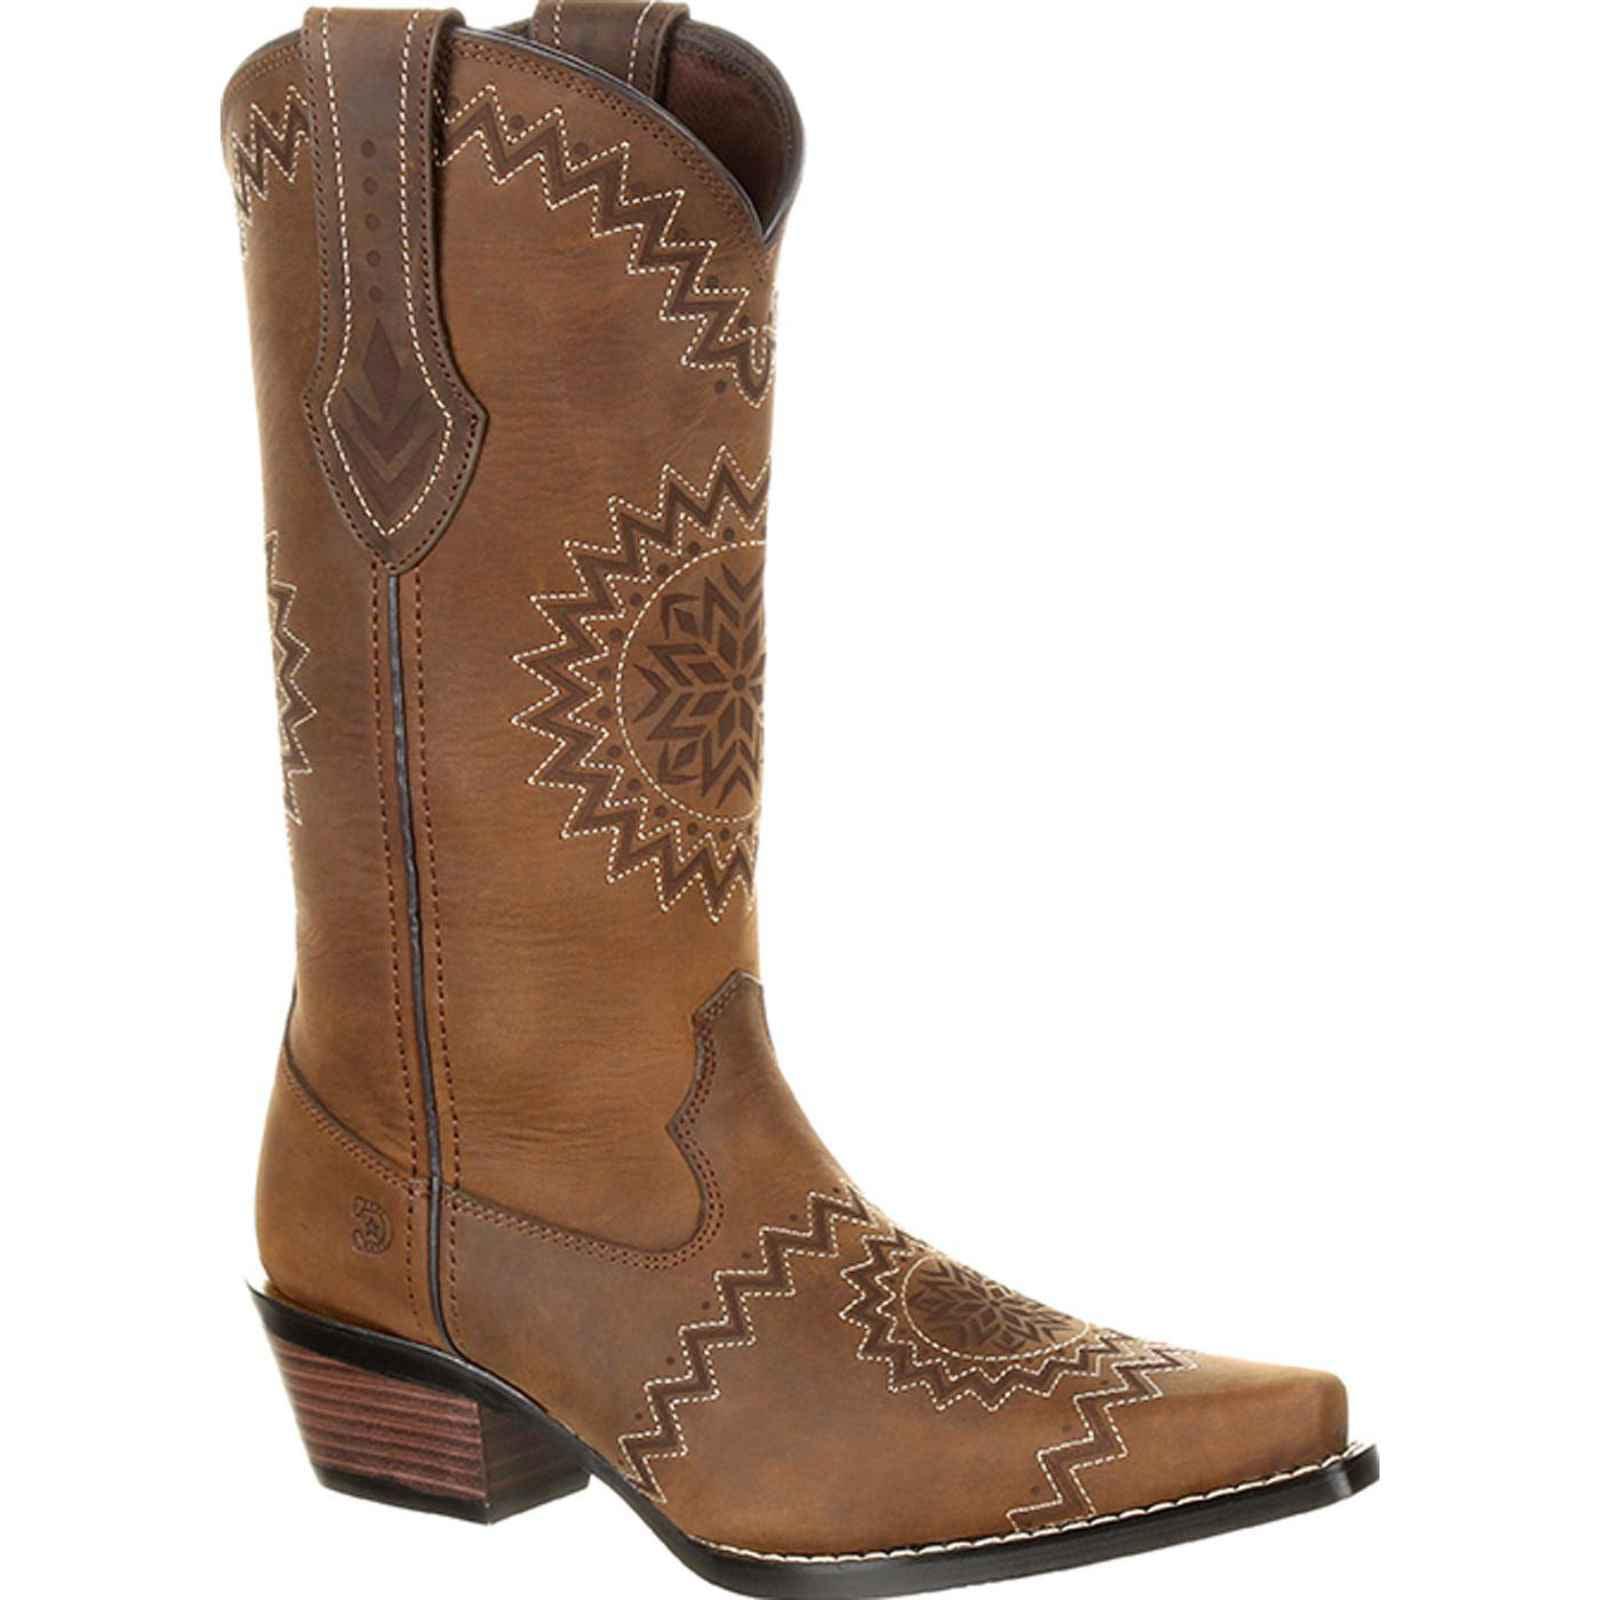 Crush by Durango Women's Laser Etch Western Boot DRD0227 by Durango